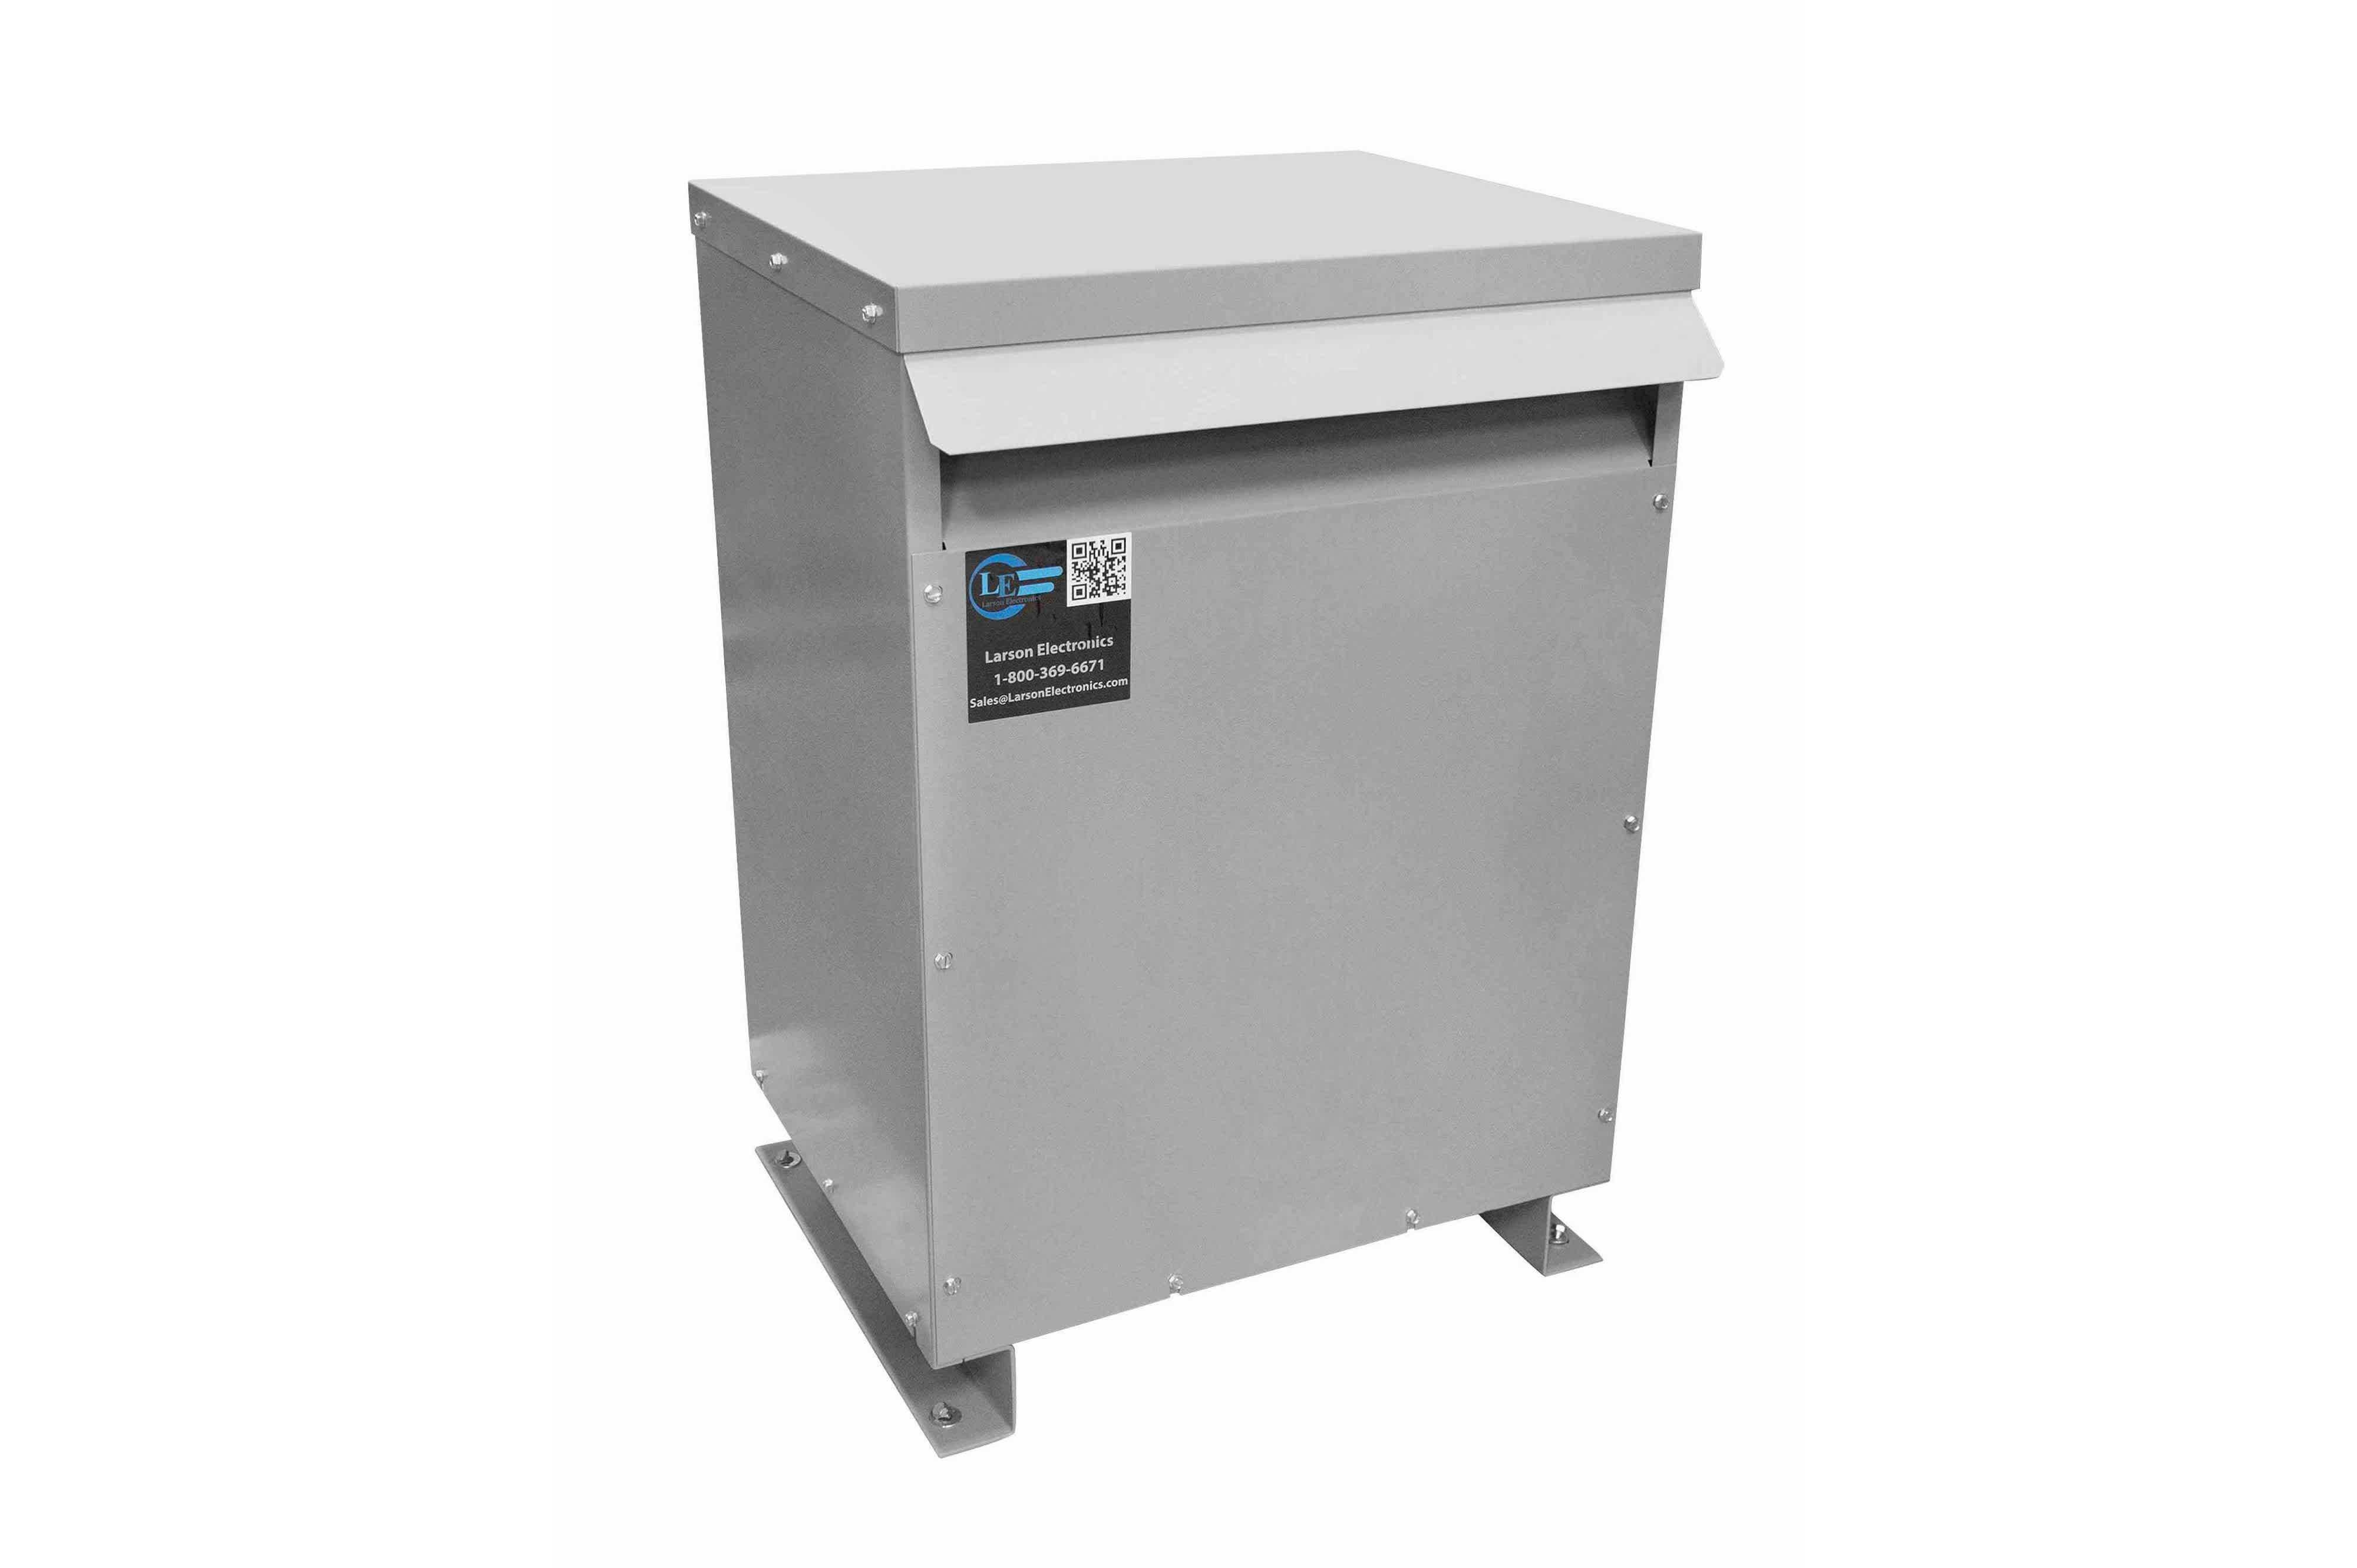 30 kVA 3PH Isolation Transformer, 460V Wye Primary, 208V Delta Secondary, N3R, Ventilated, 60 Hz